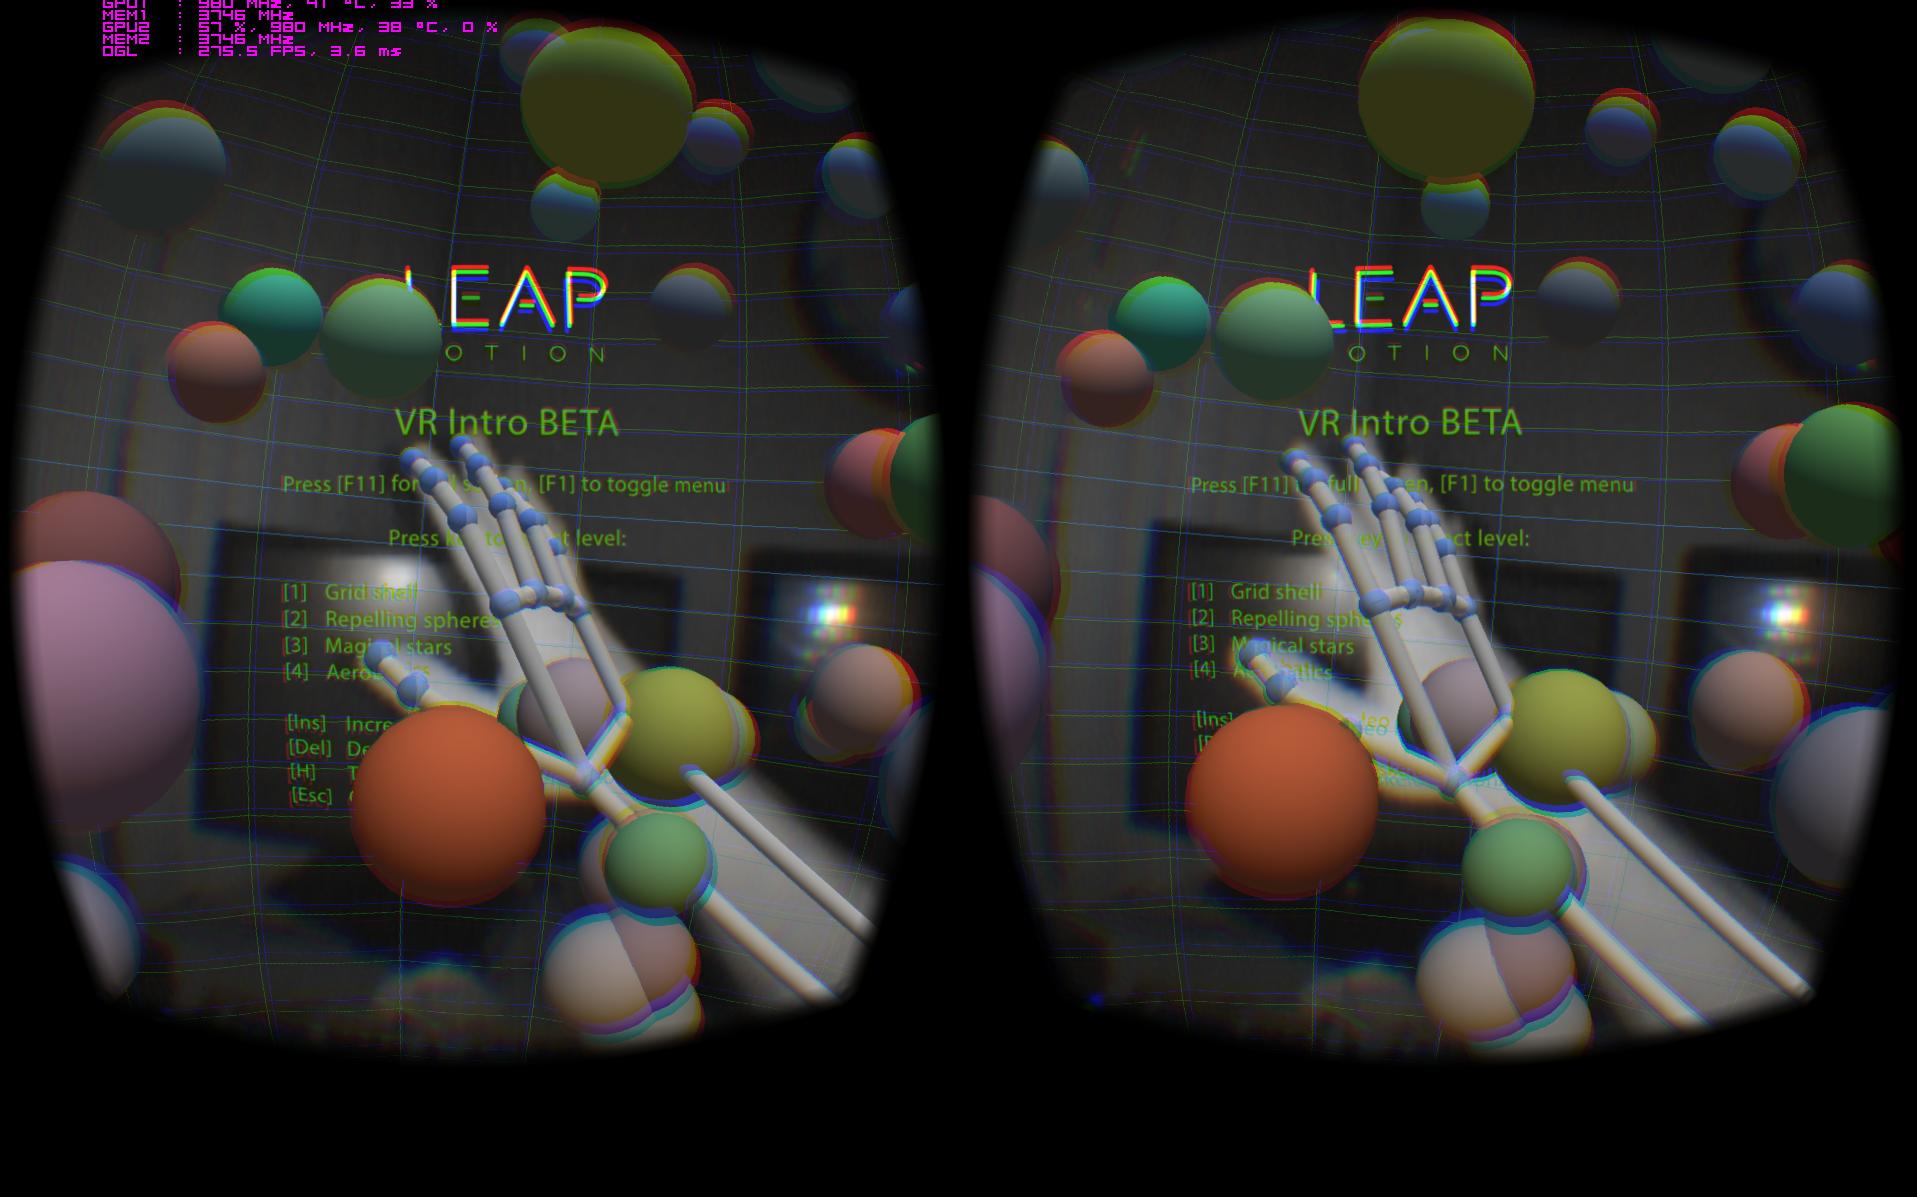 Leap VR DK2